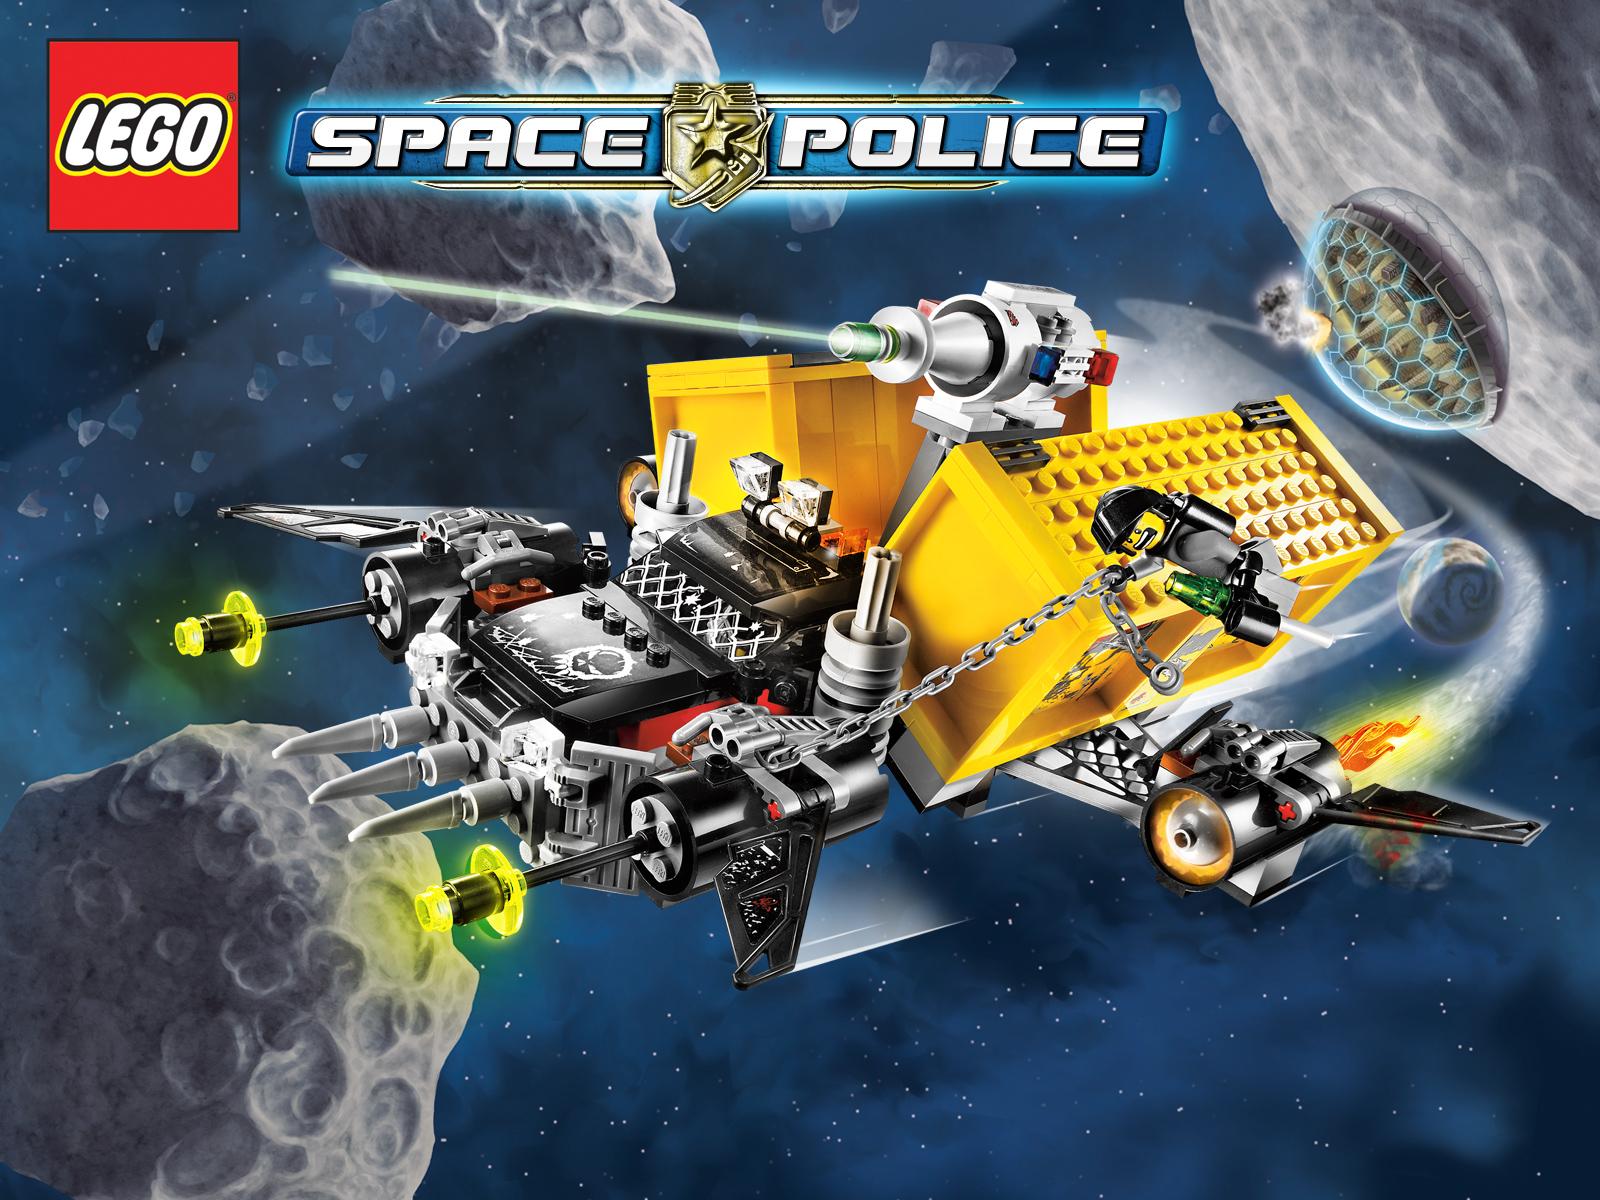 image - space police iii wallpaper3 | brickipedia | fandom